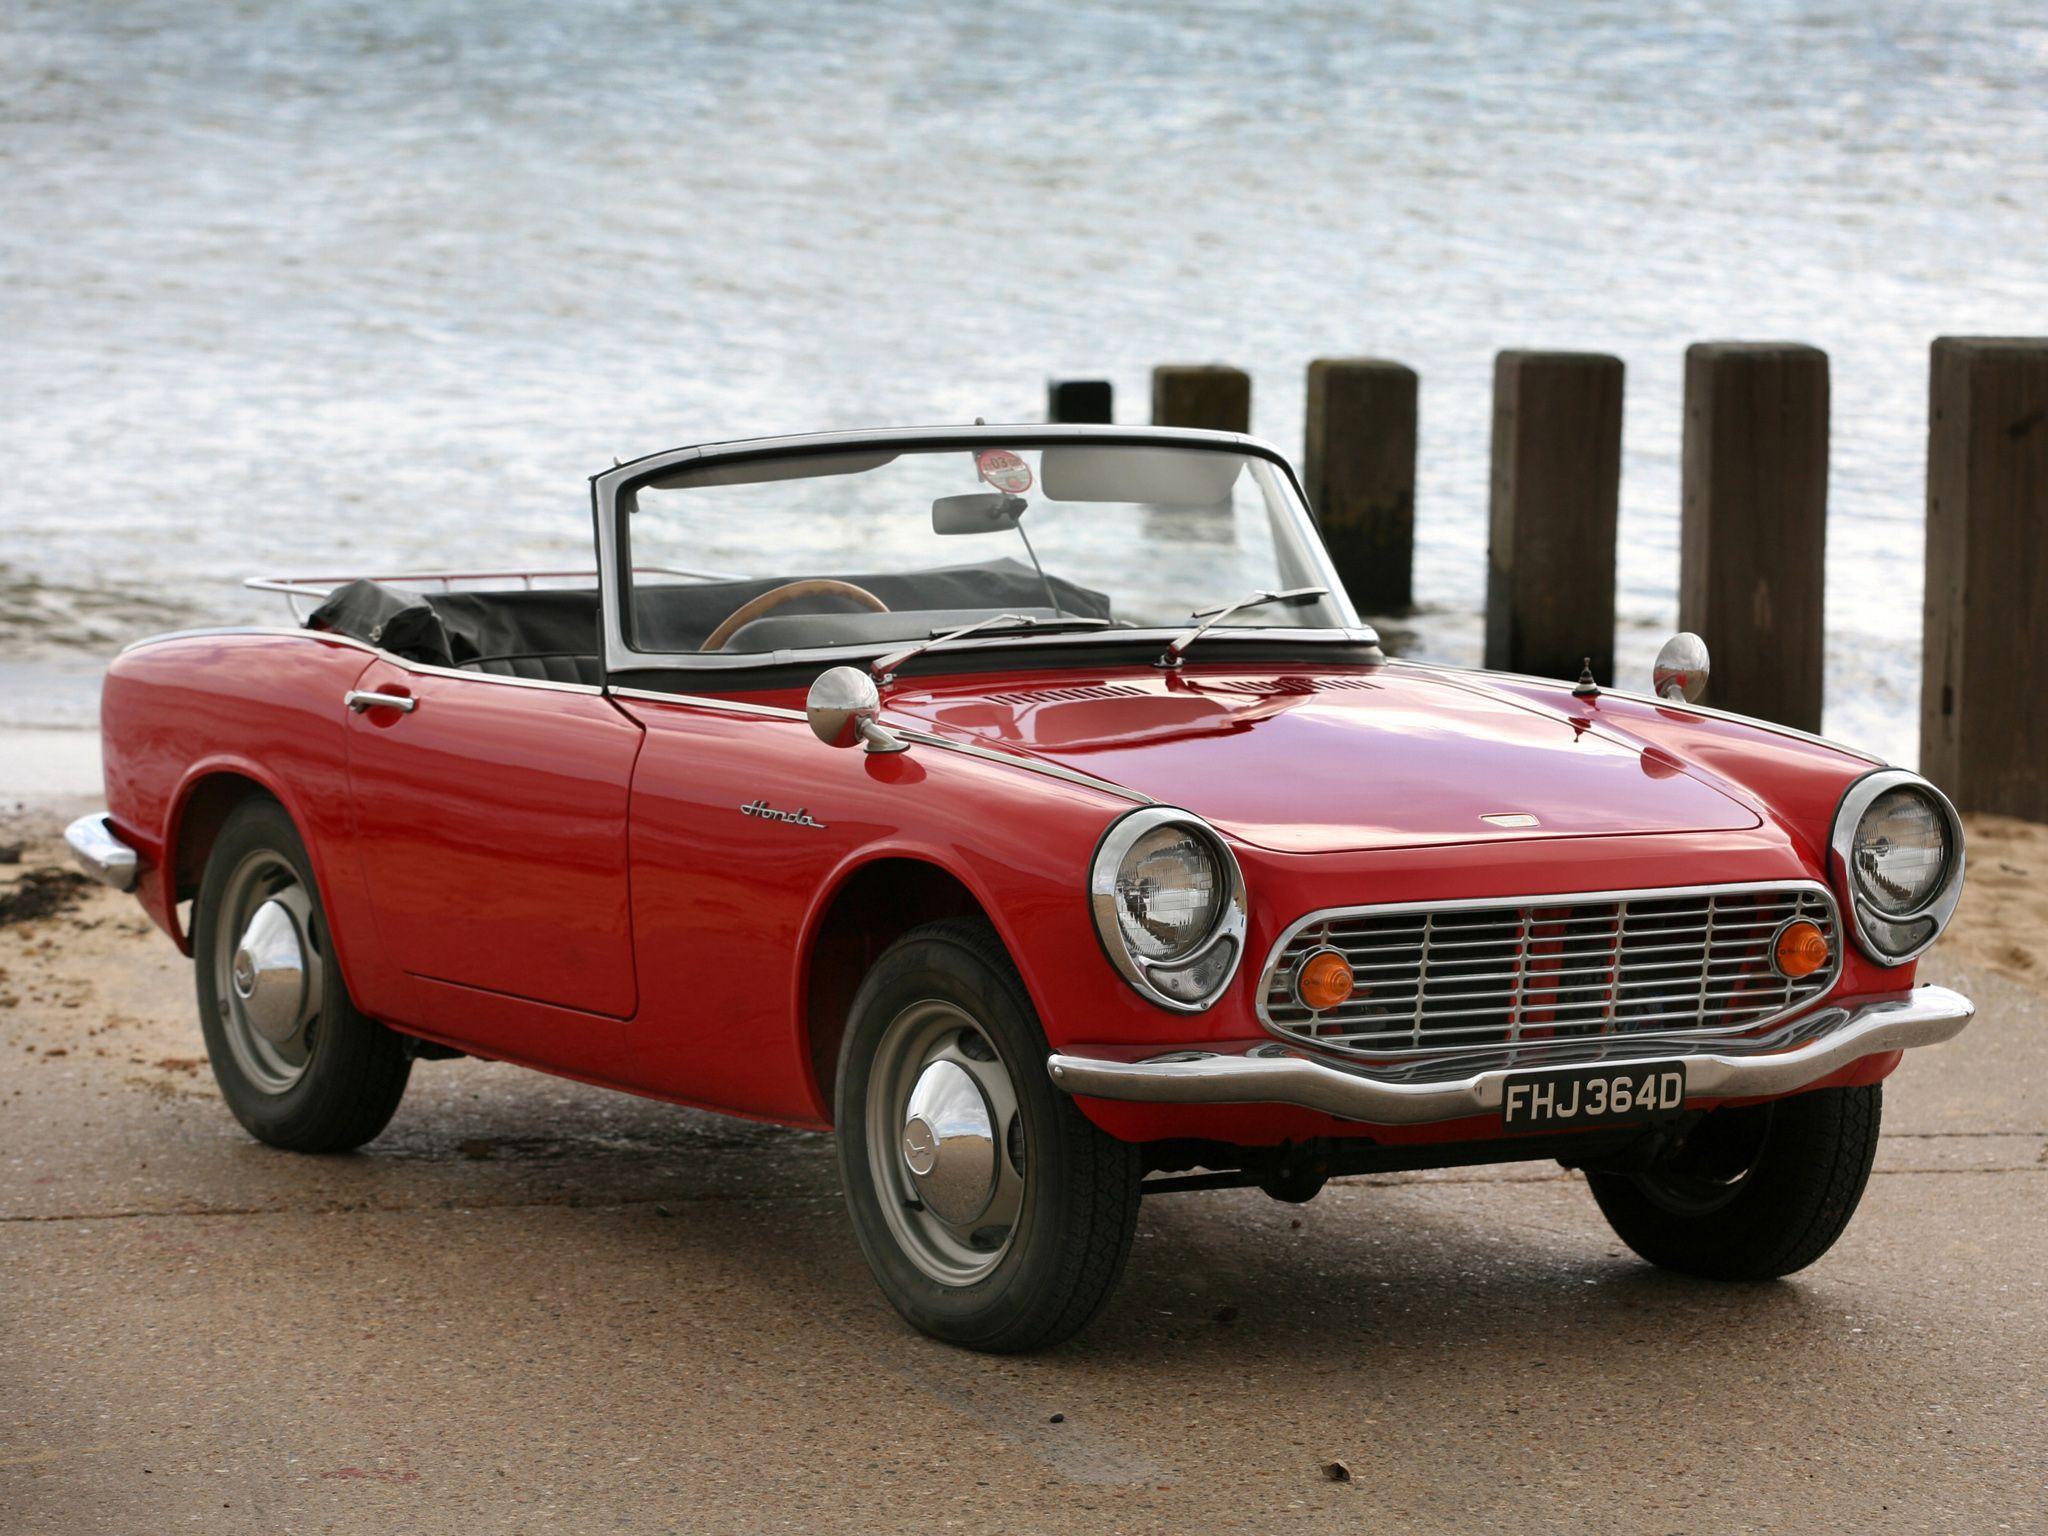 Gentil Sports Cars · Honda S600. 606 Cc, 57 Hp. 1964 66. Chain Drive!